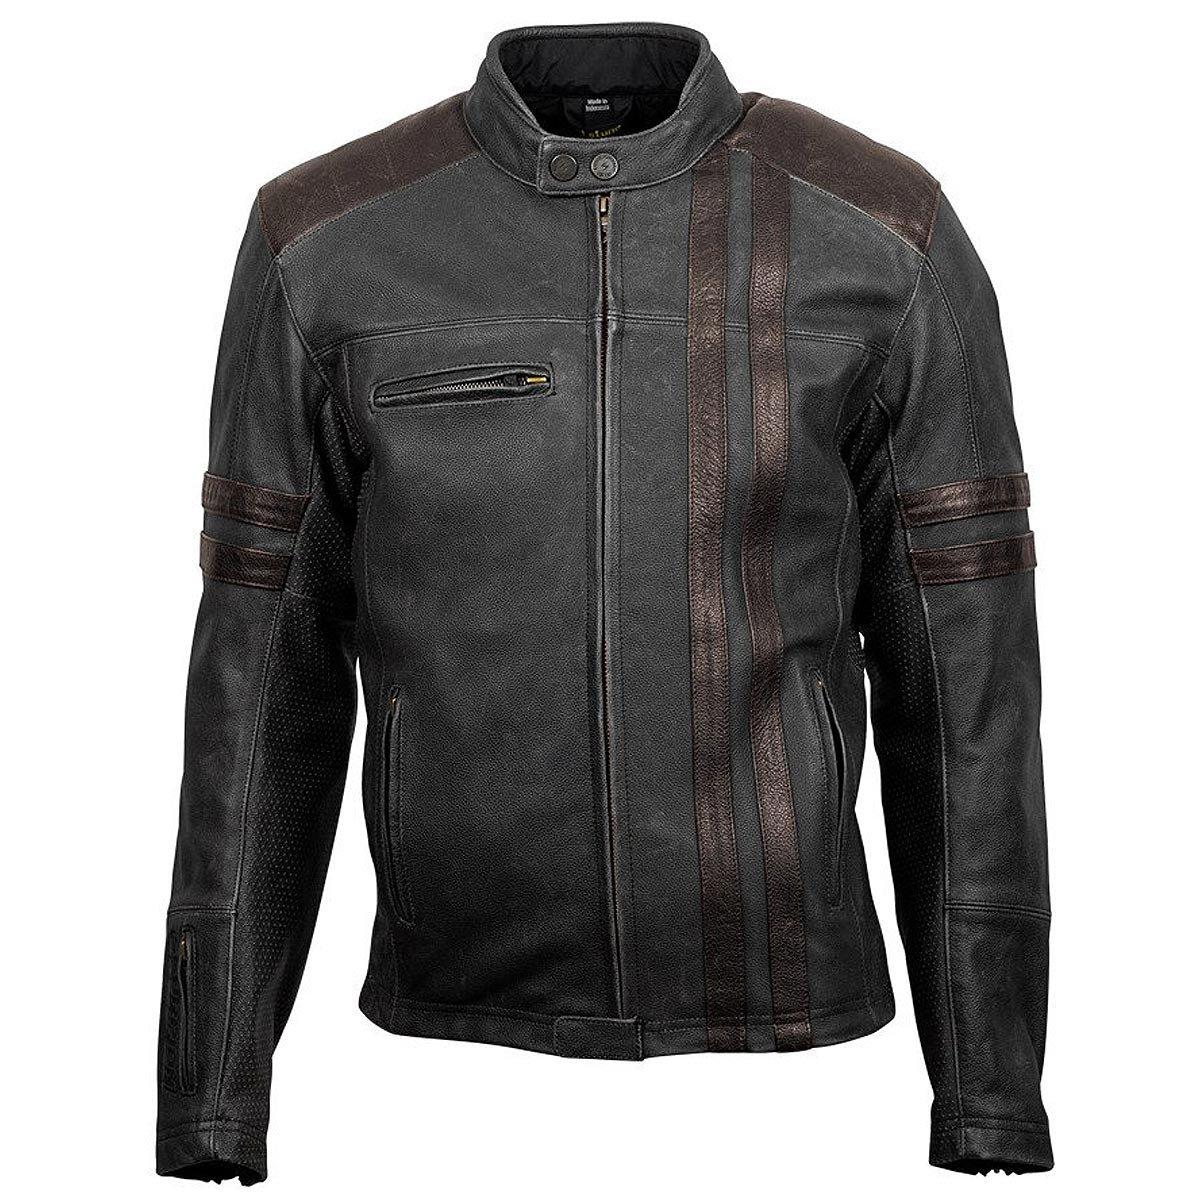 Scorpion EXO Men's 1909 Distressed Black Leather Jacket, 3XL